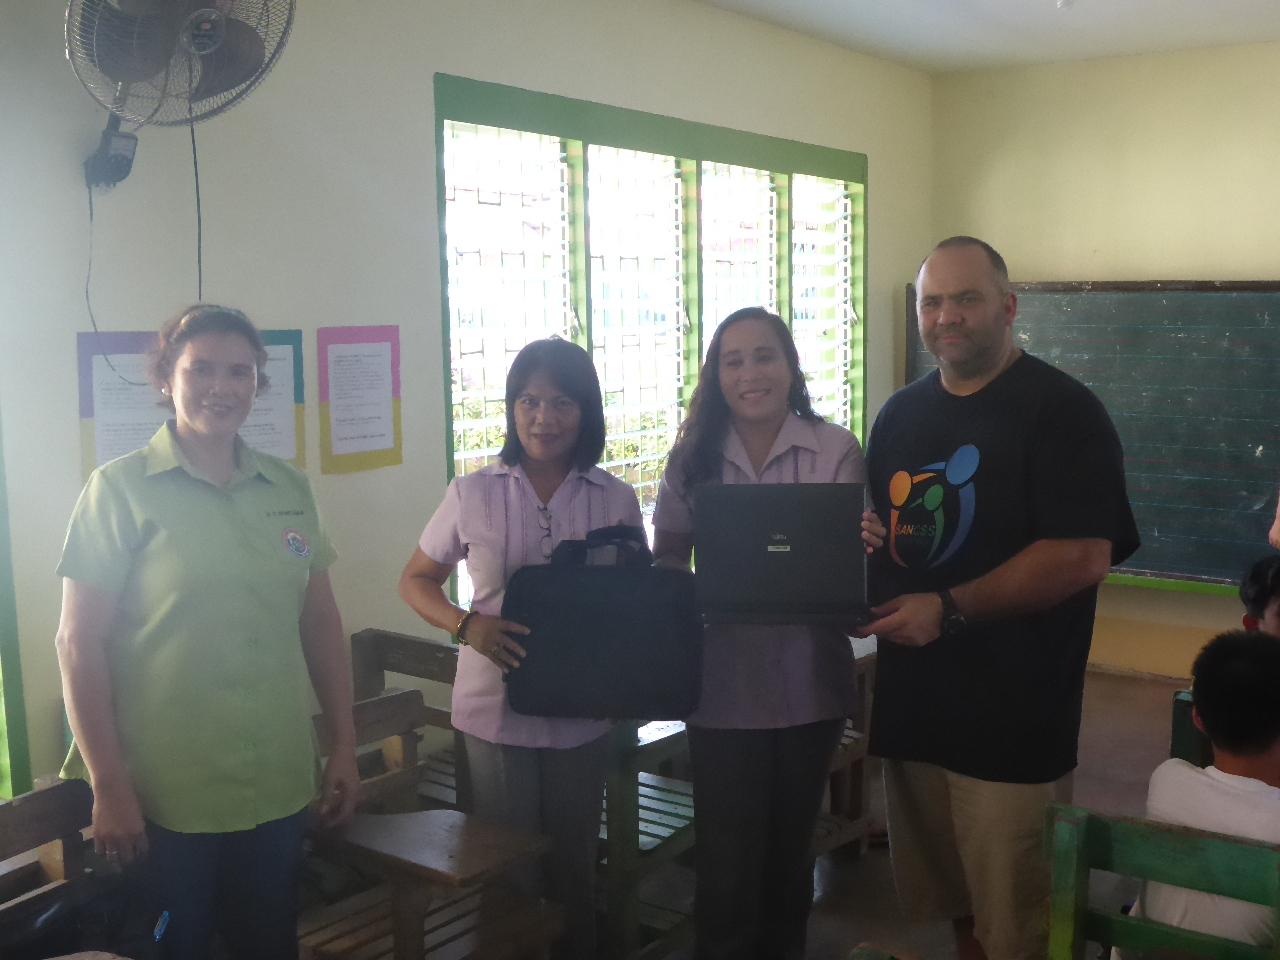 laptop-presentation-elementary-school